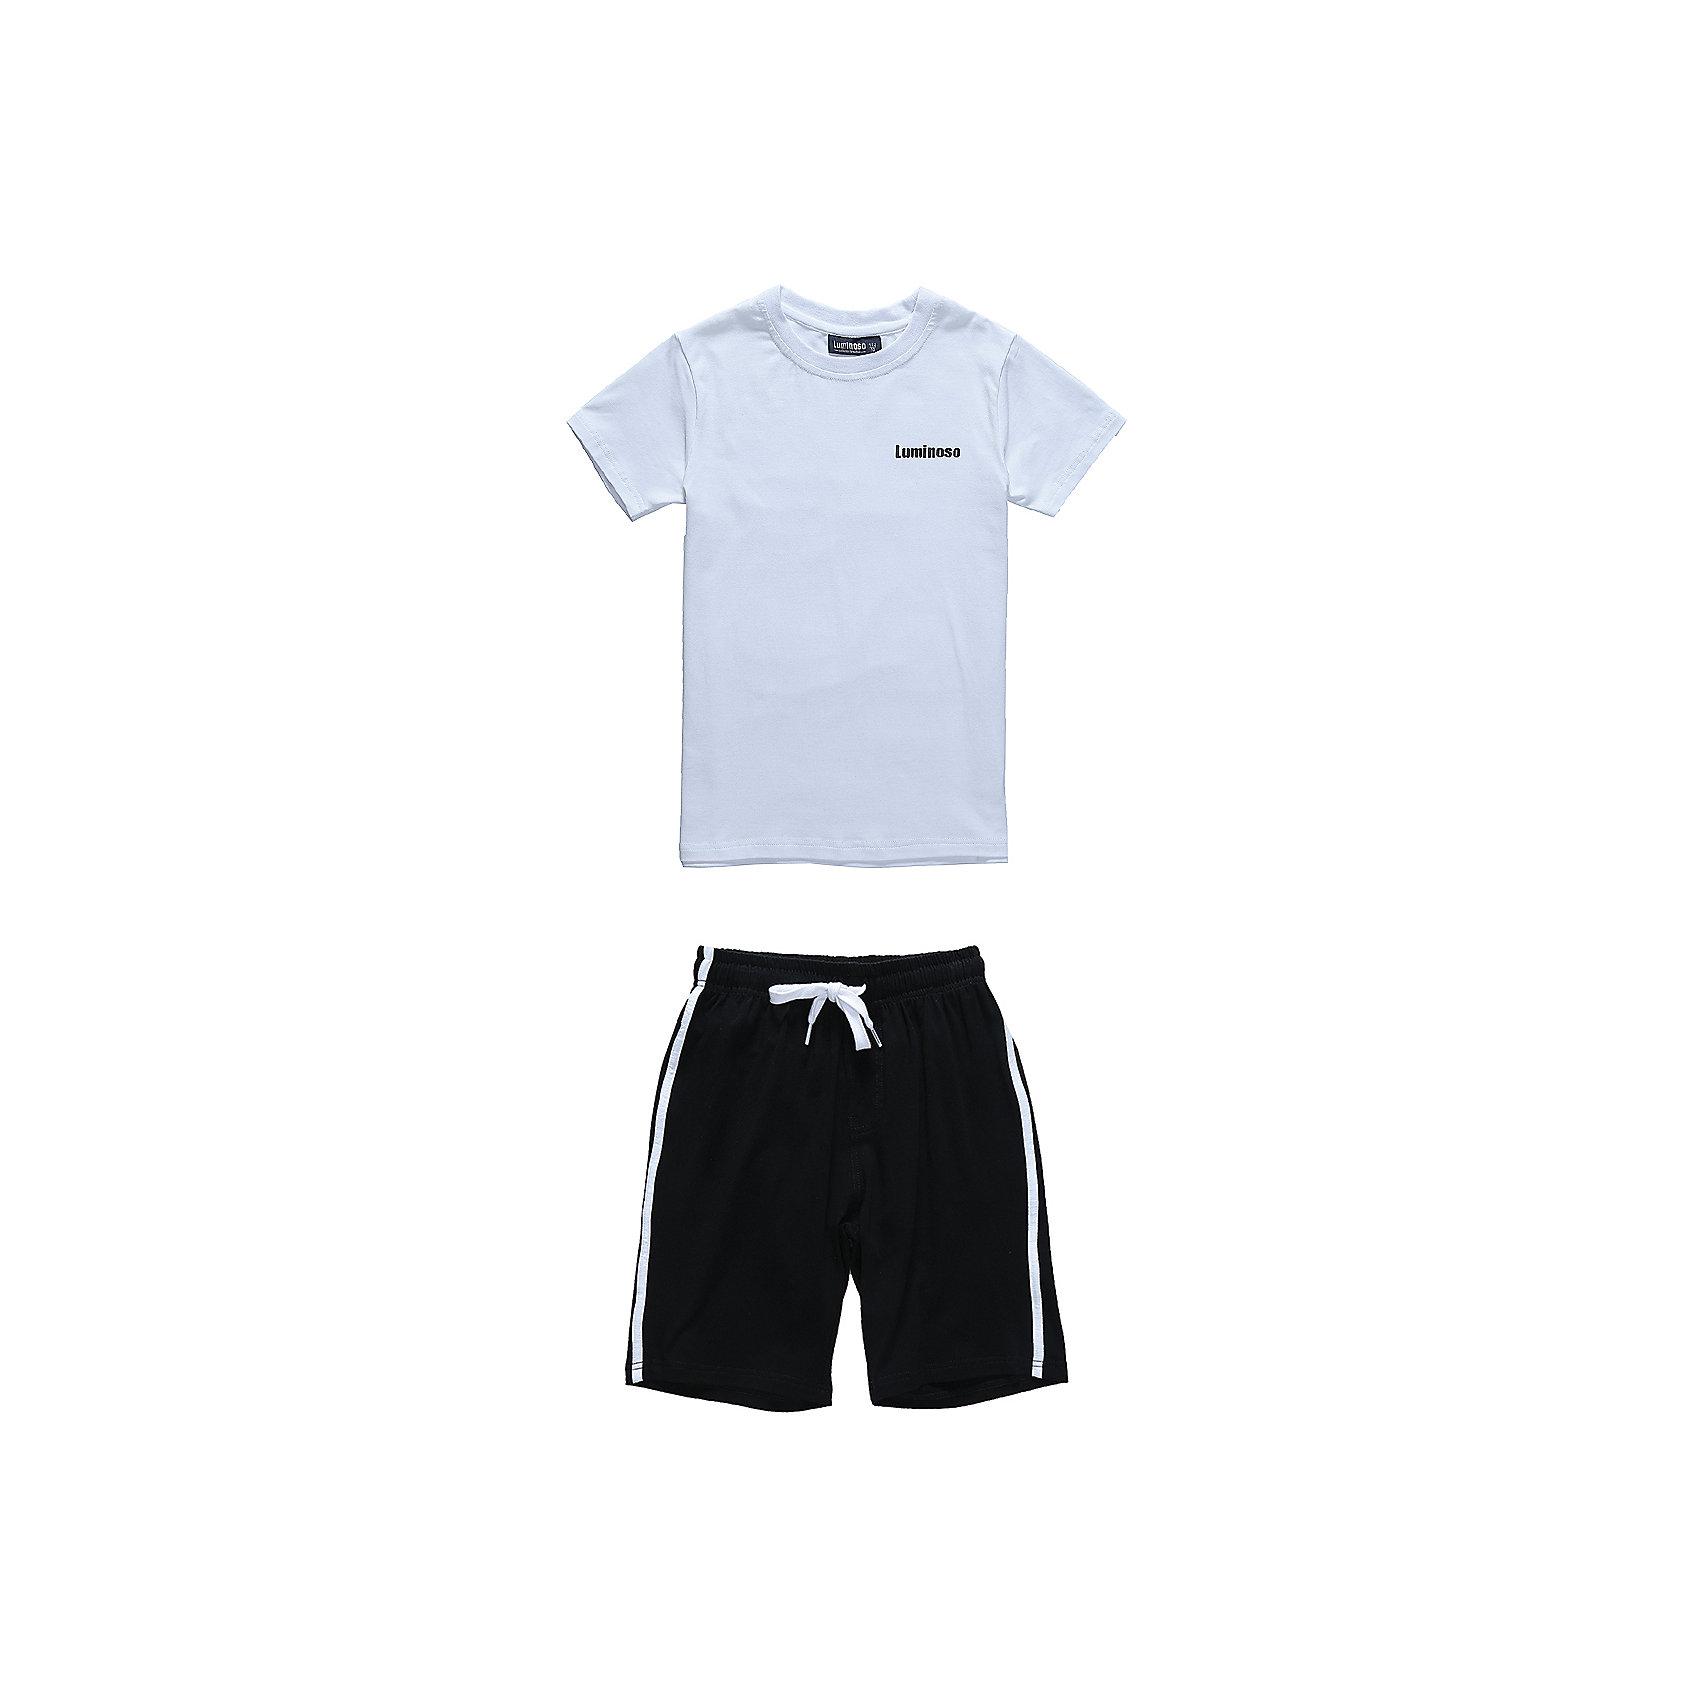 Комплект: футболка и шорты для мальчика LuminosoСпортивная форма<br>Состав:<br>95% хлопок, 5% эластан<br><br>Ширина мм: 191<br>Глубина мм: 10<br>Высота мм: 175<br>Вес г: 273<br>Цвет: белый<br>Возраст от месяцев: 156<br>Возраст до месяцев: 168<br>Пол: Мужской<br>Возраст: Детский<br>Размер: 164,122,128,134,140,146,152,158<br>SKU: 6672563